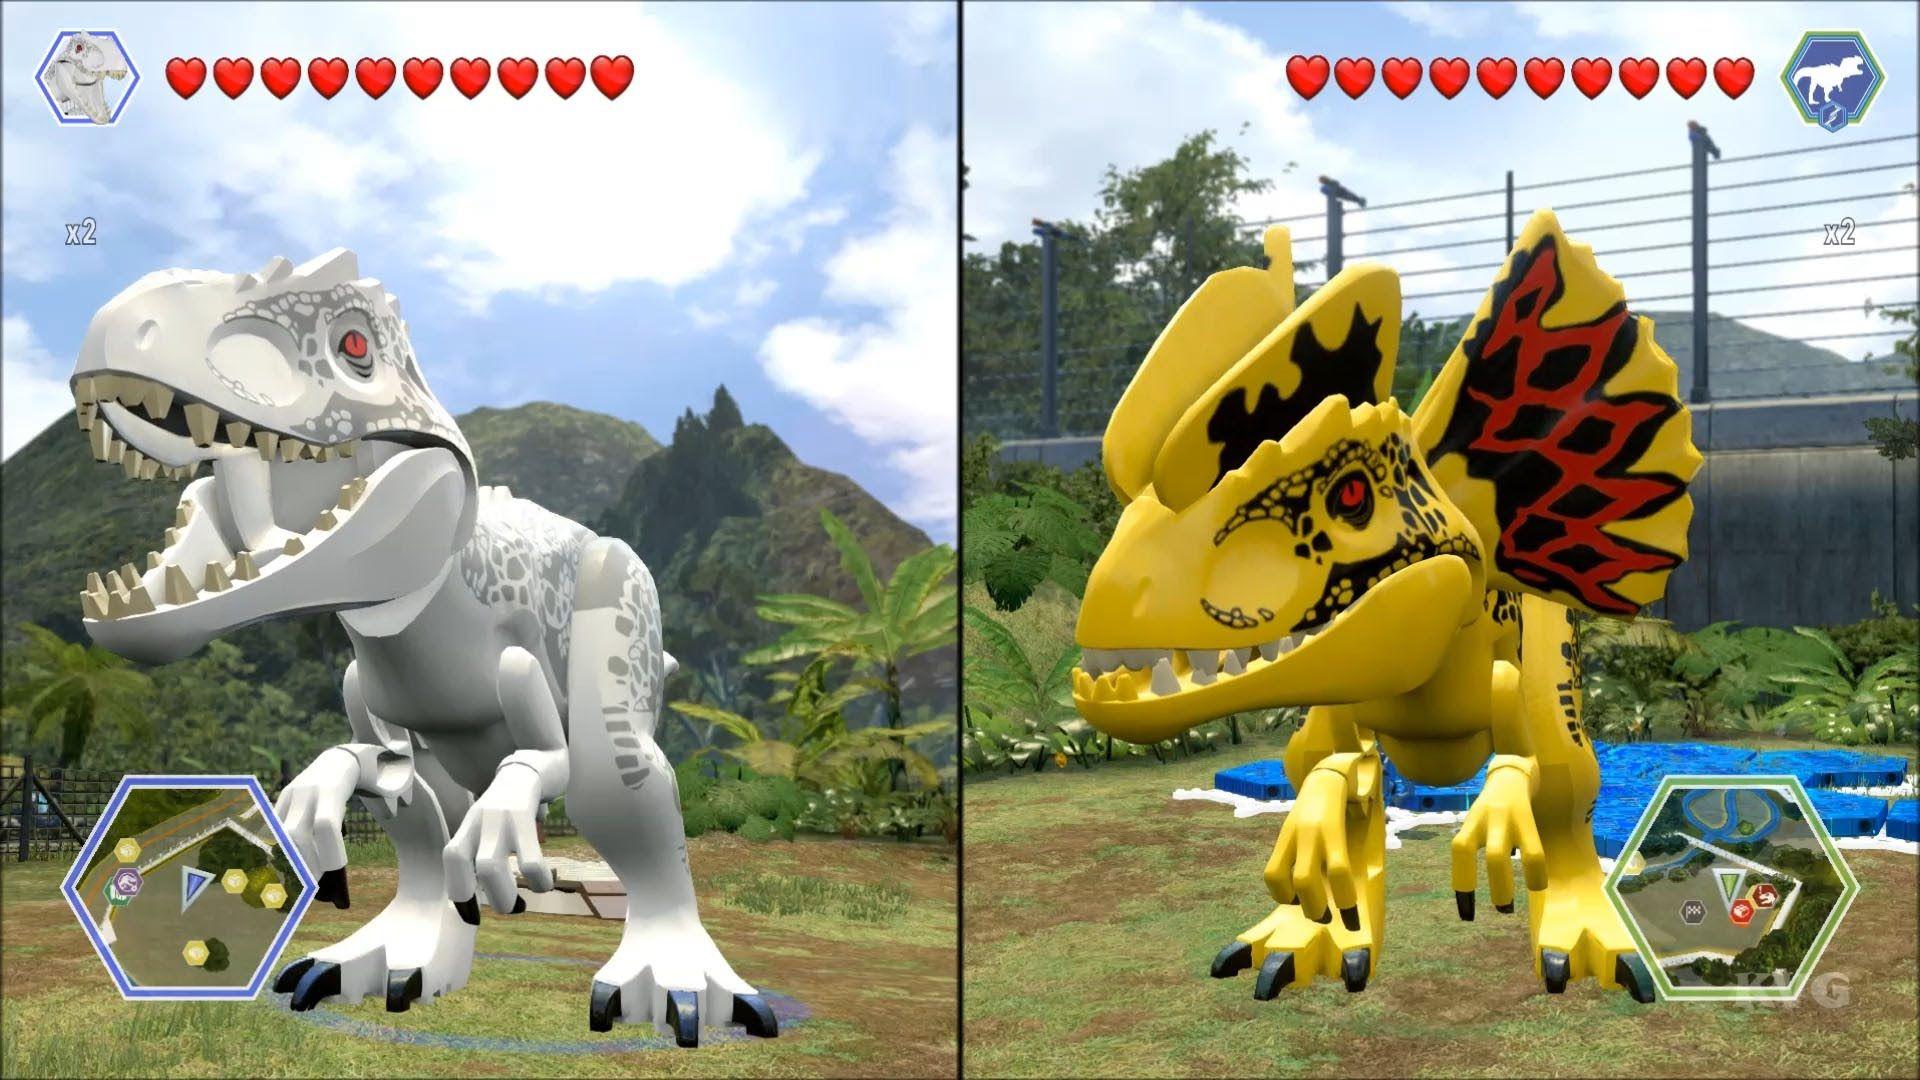 LEGO Jurassic World Indominus Rex vs Custom Indominus